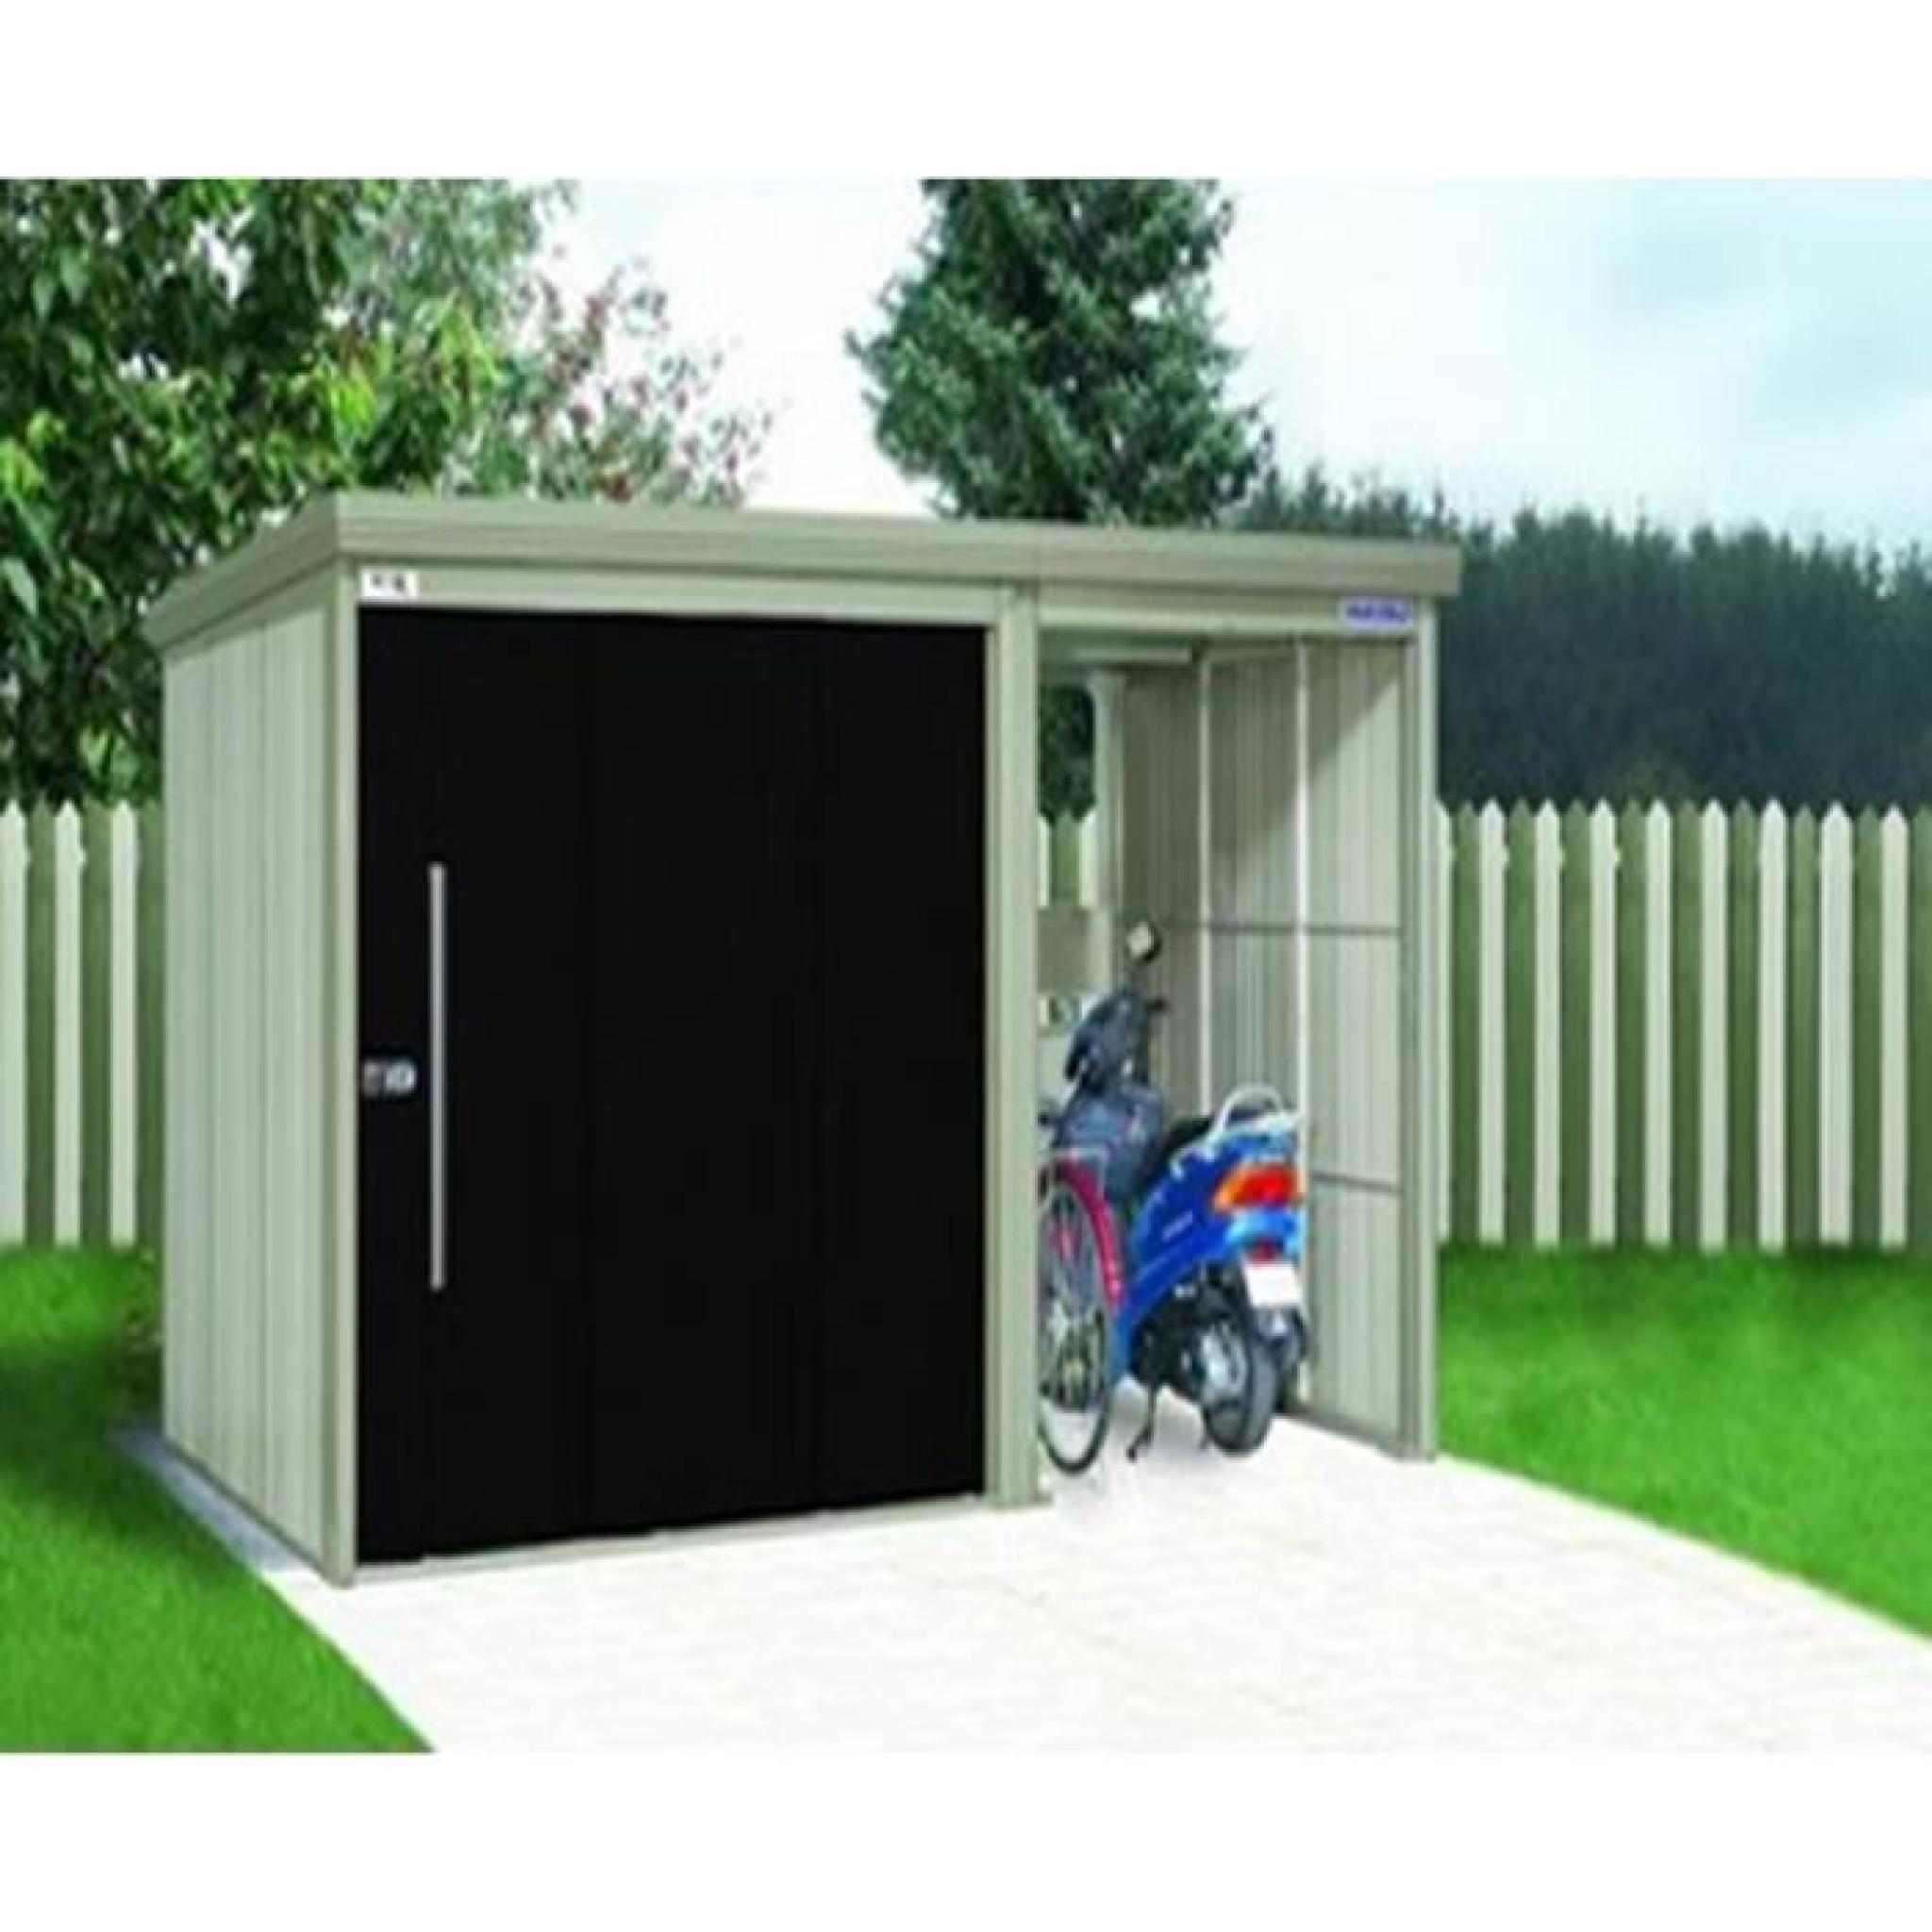 Abri de jardin en acier galvanis avec portes noires 382 for Portes de jardin en metal